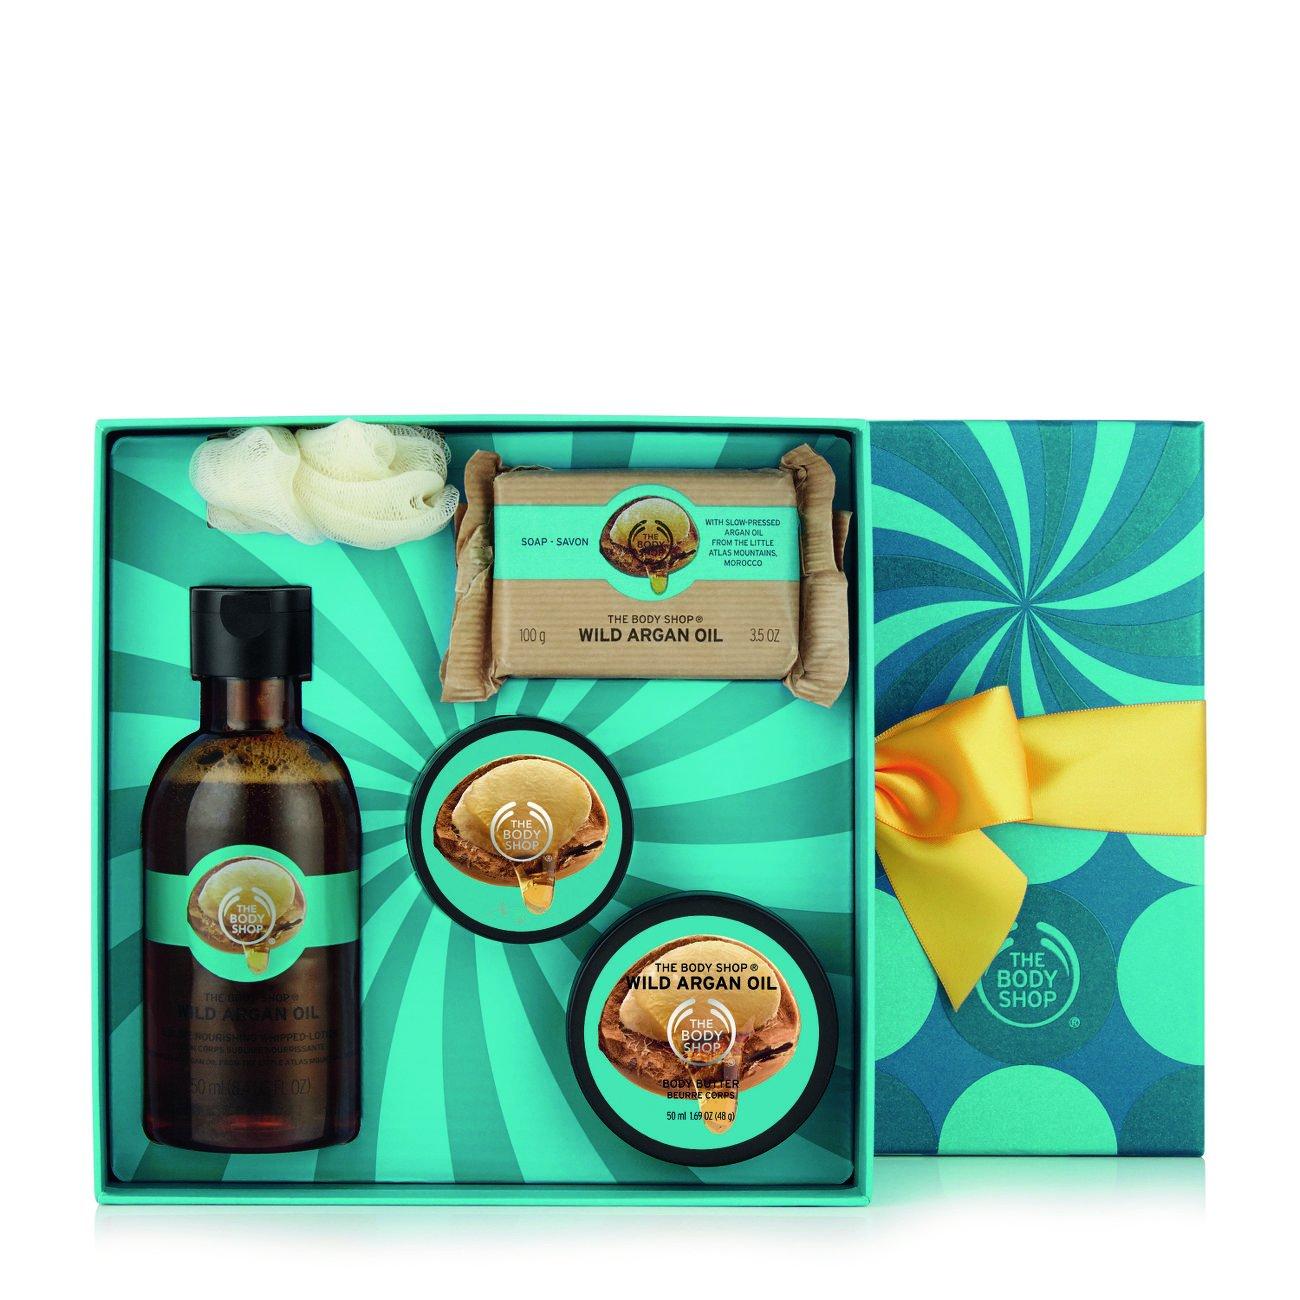 The Body Shop Wild Argan Oil Festive Picks Small Gift Set